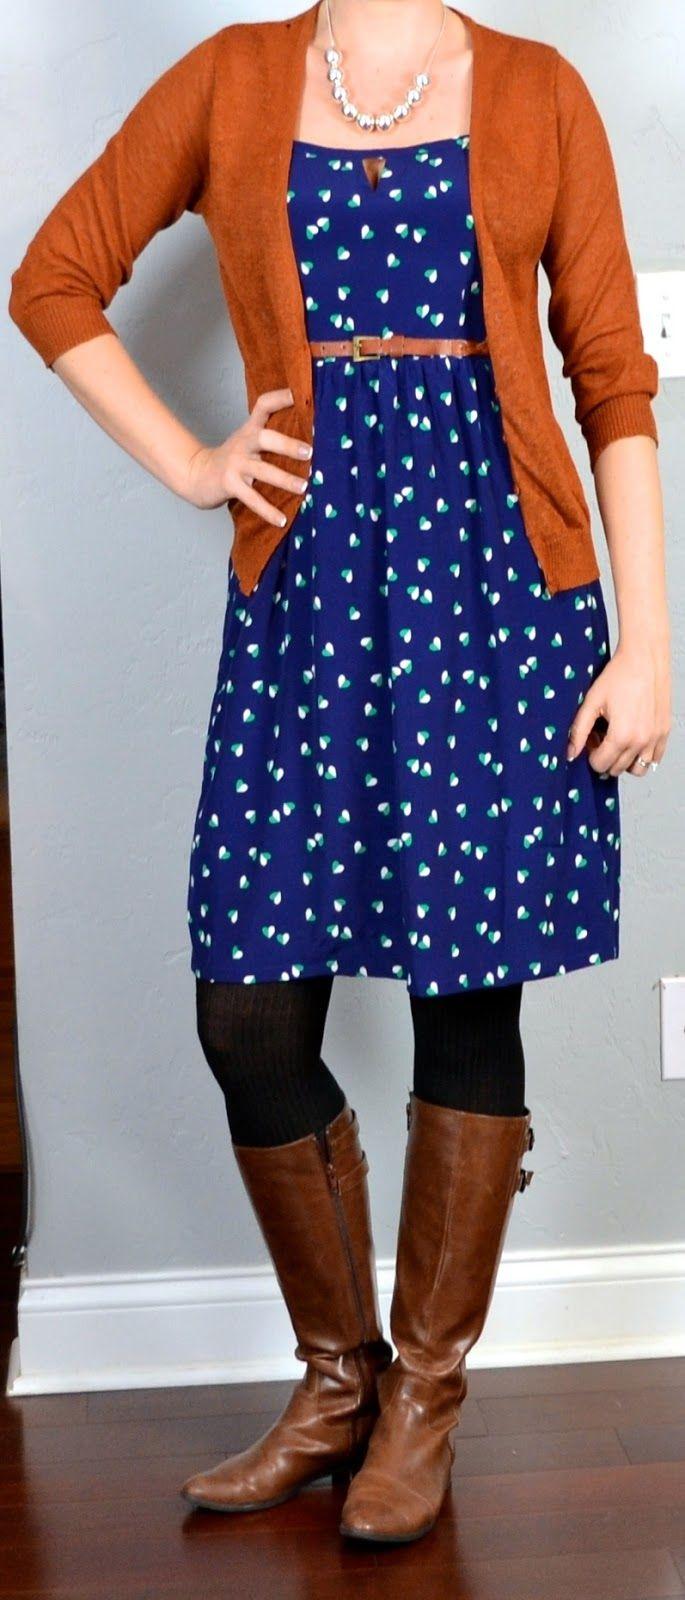 Blue dress and cardigan